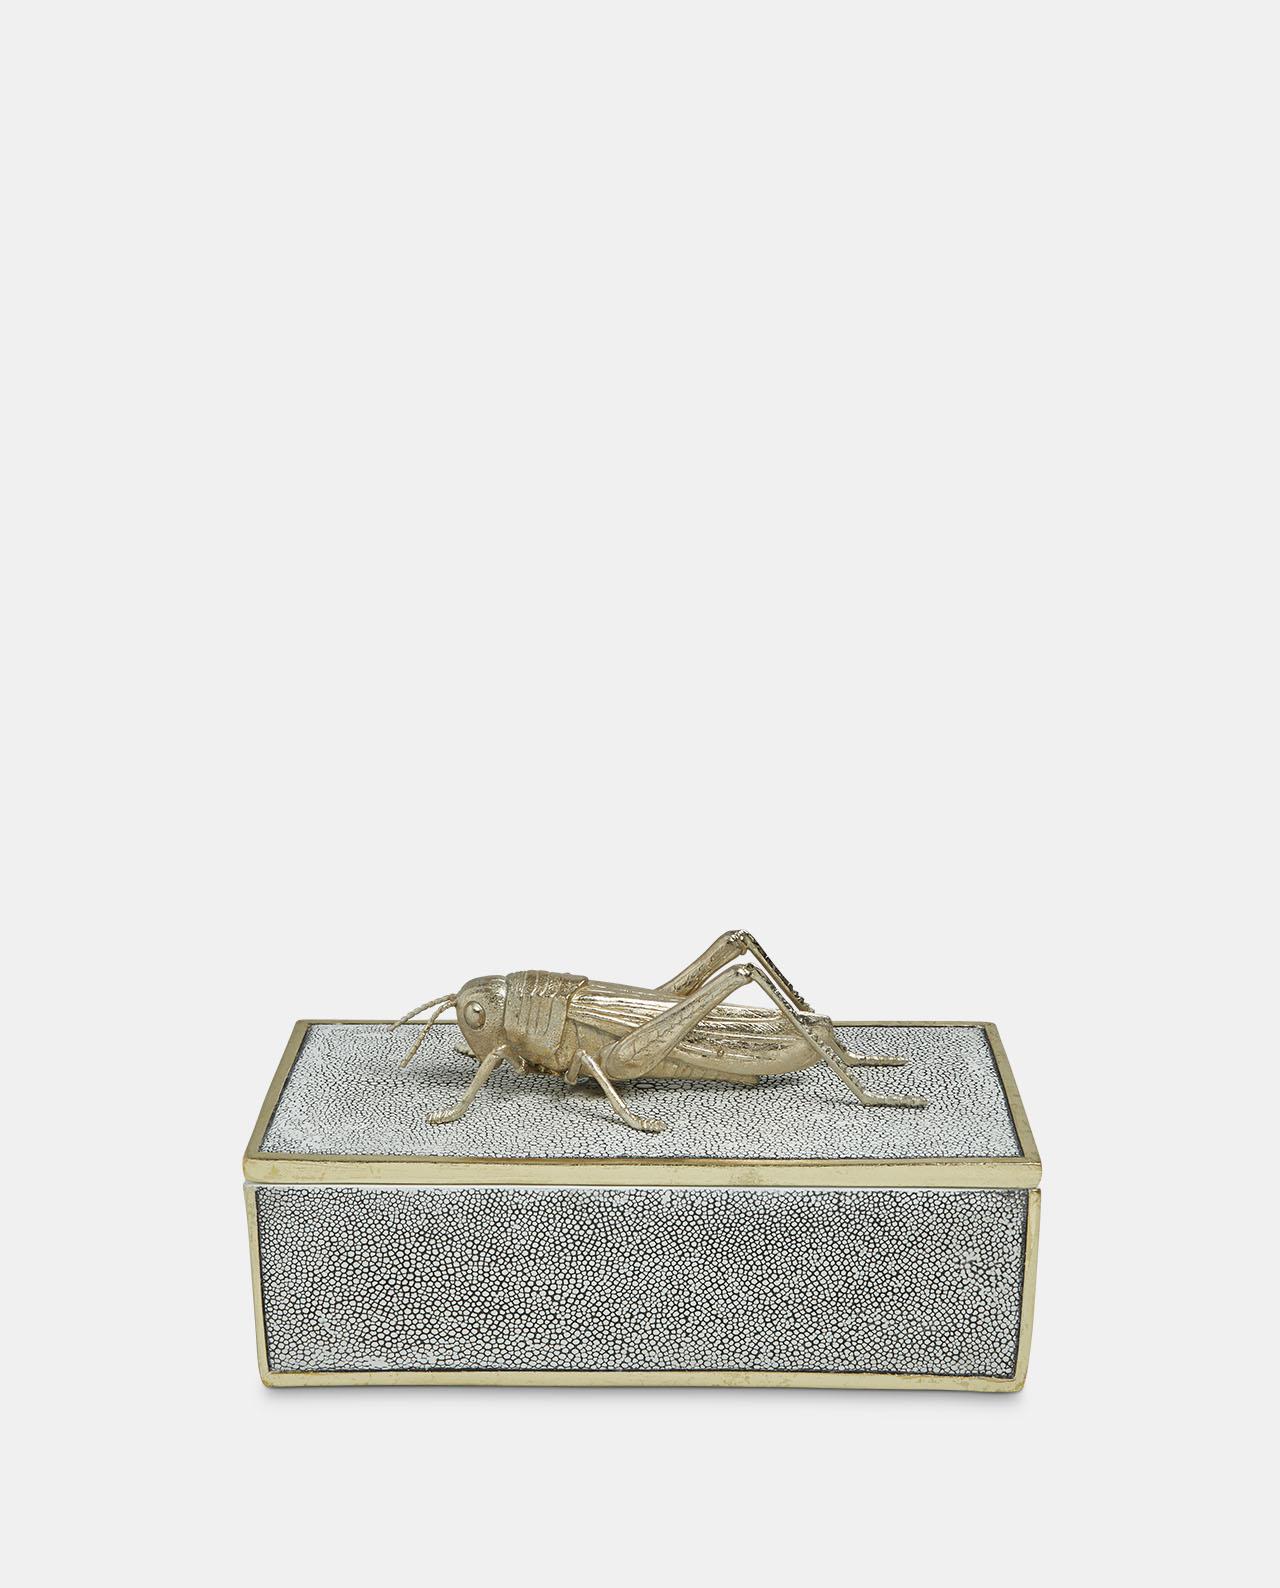 Decorative Grasshopper Box